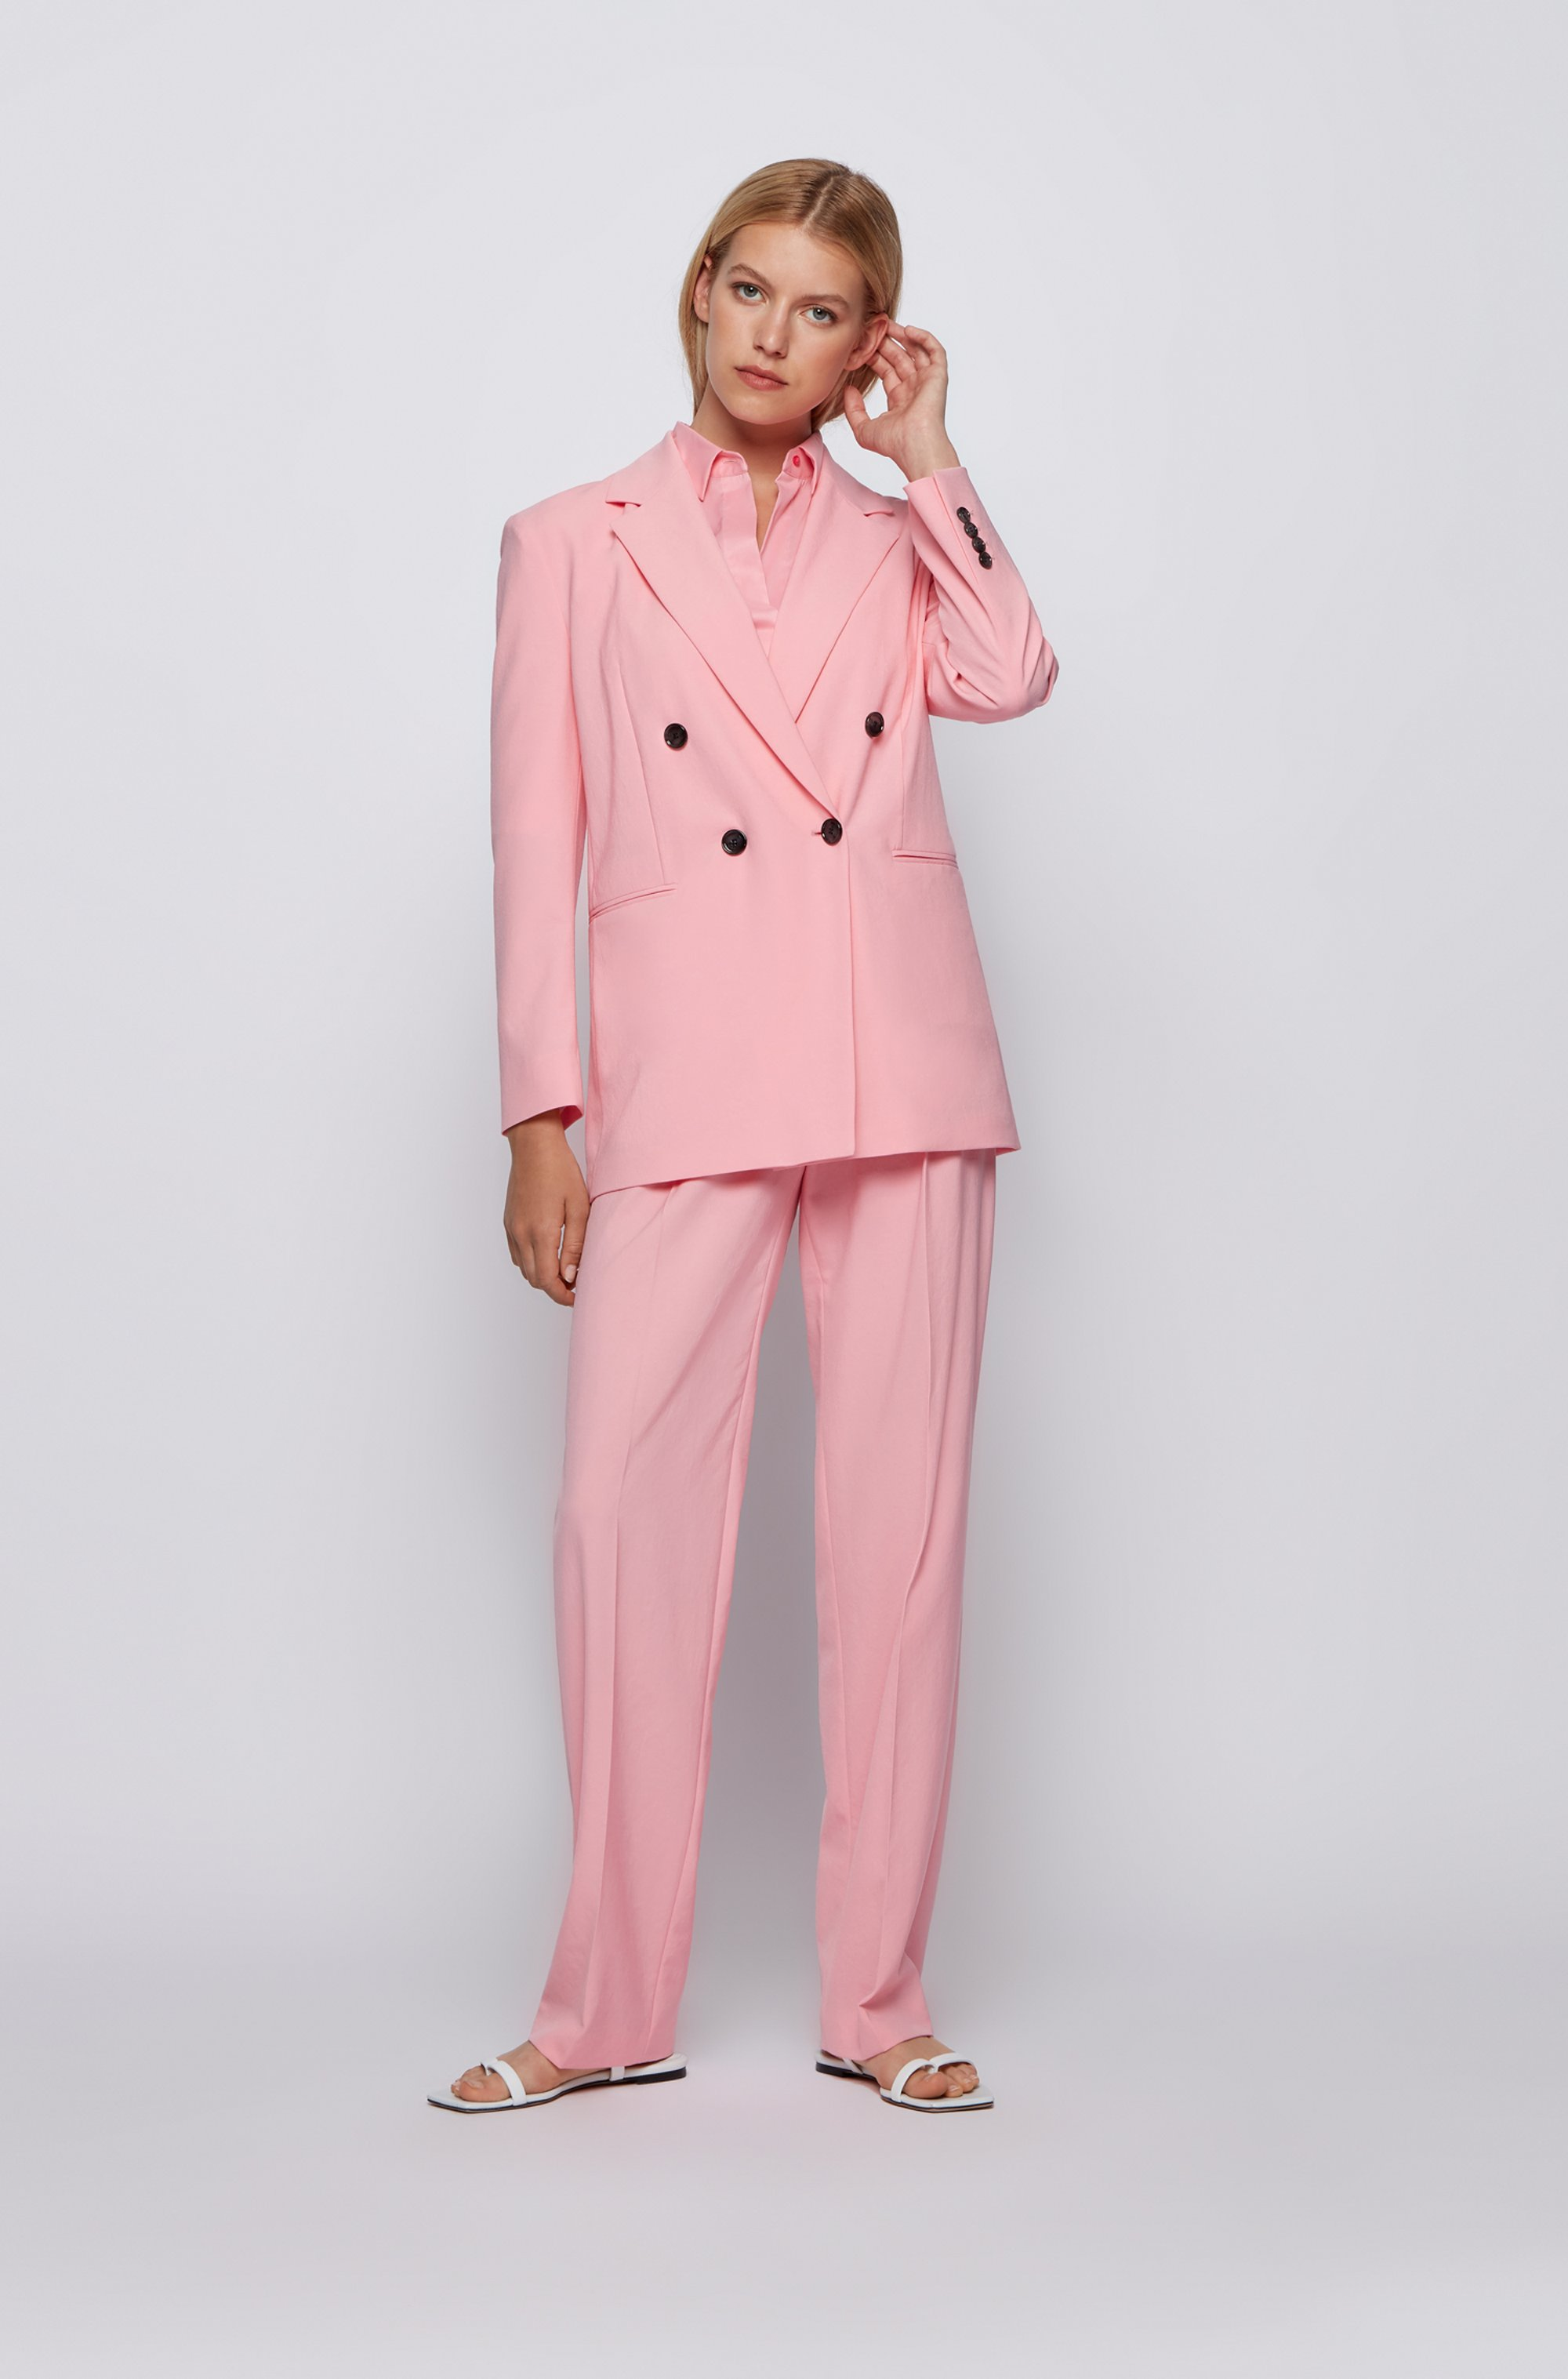 Short-sleeved blouse in cotton-blend poplin